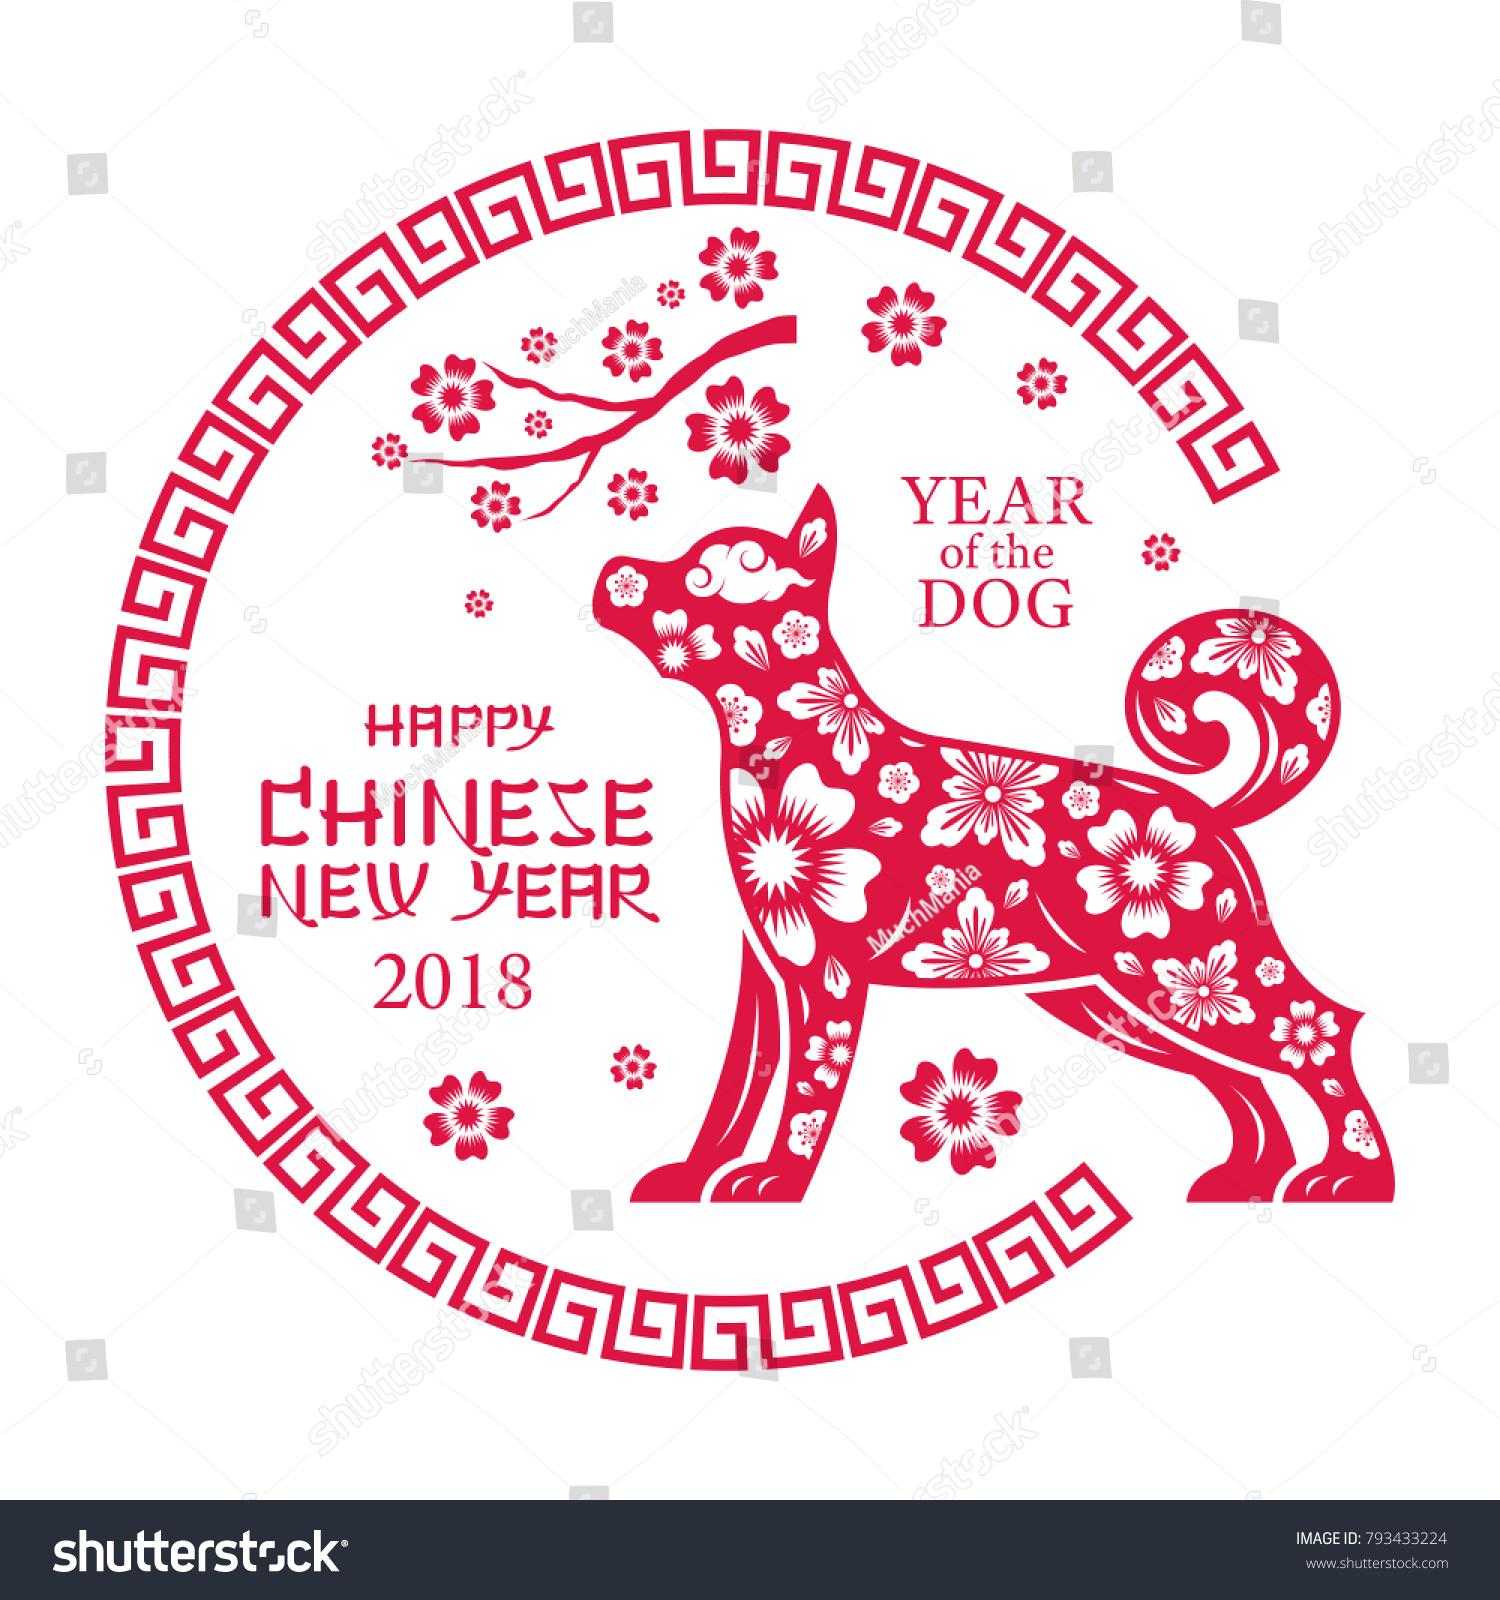 Dog symbol paper cutting chinese new stock vector 793433224 dog symbol paper cutting chinese new year 2018 zodiac holiday greeting biocorpaavc